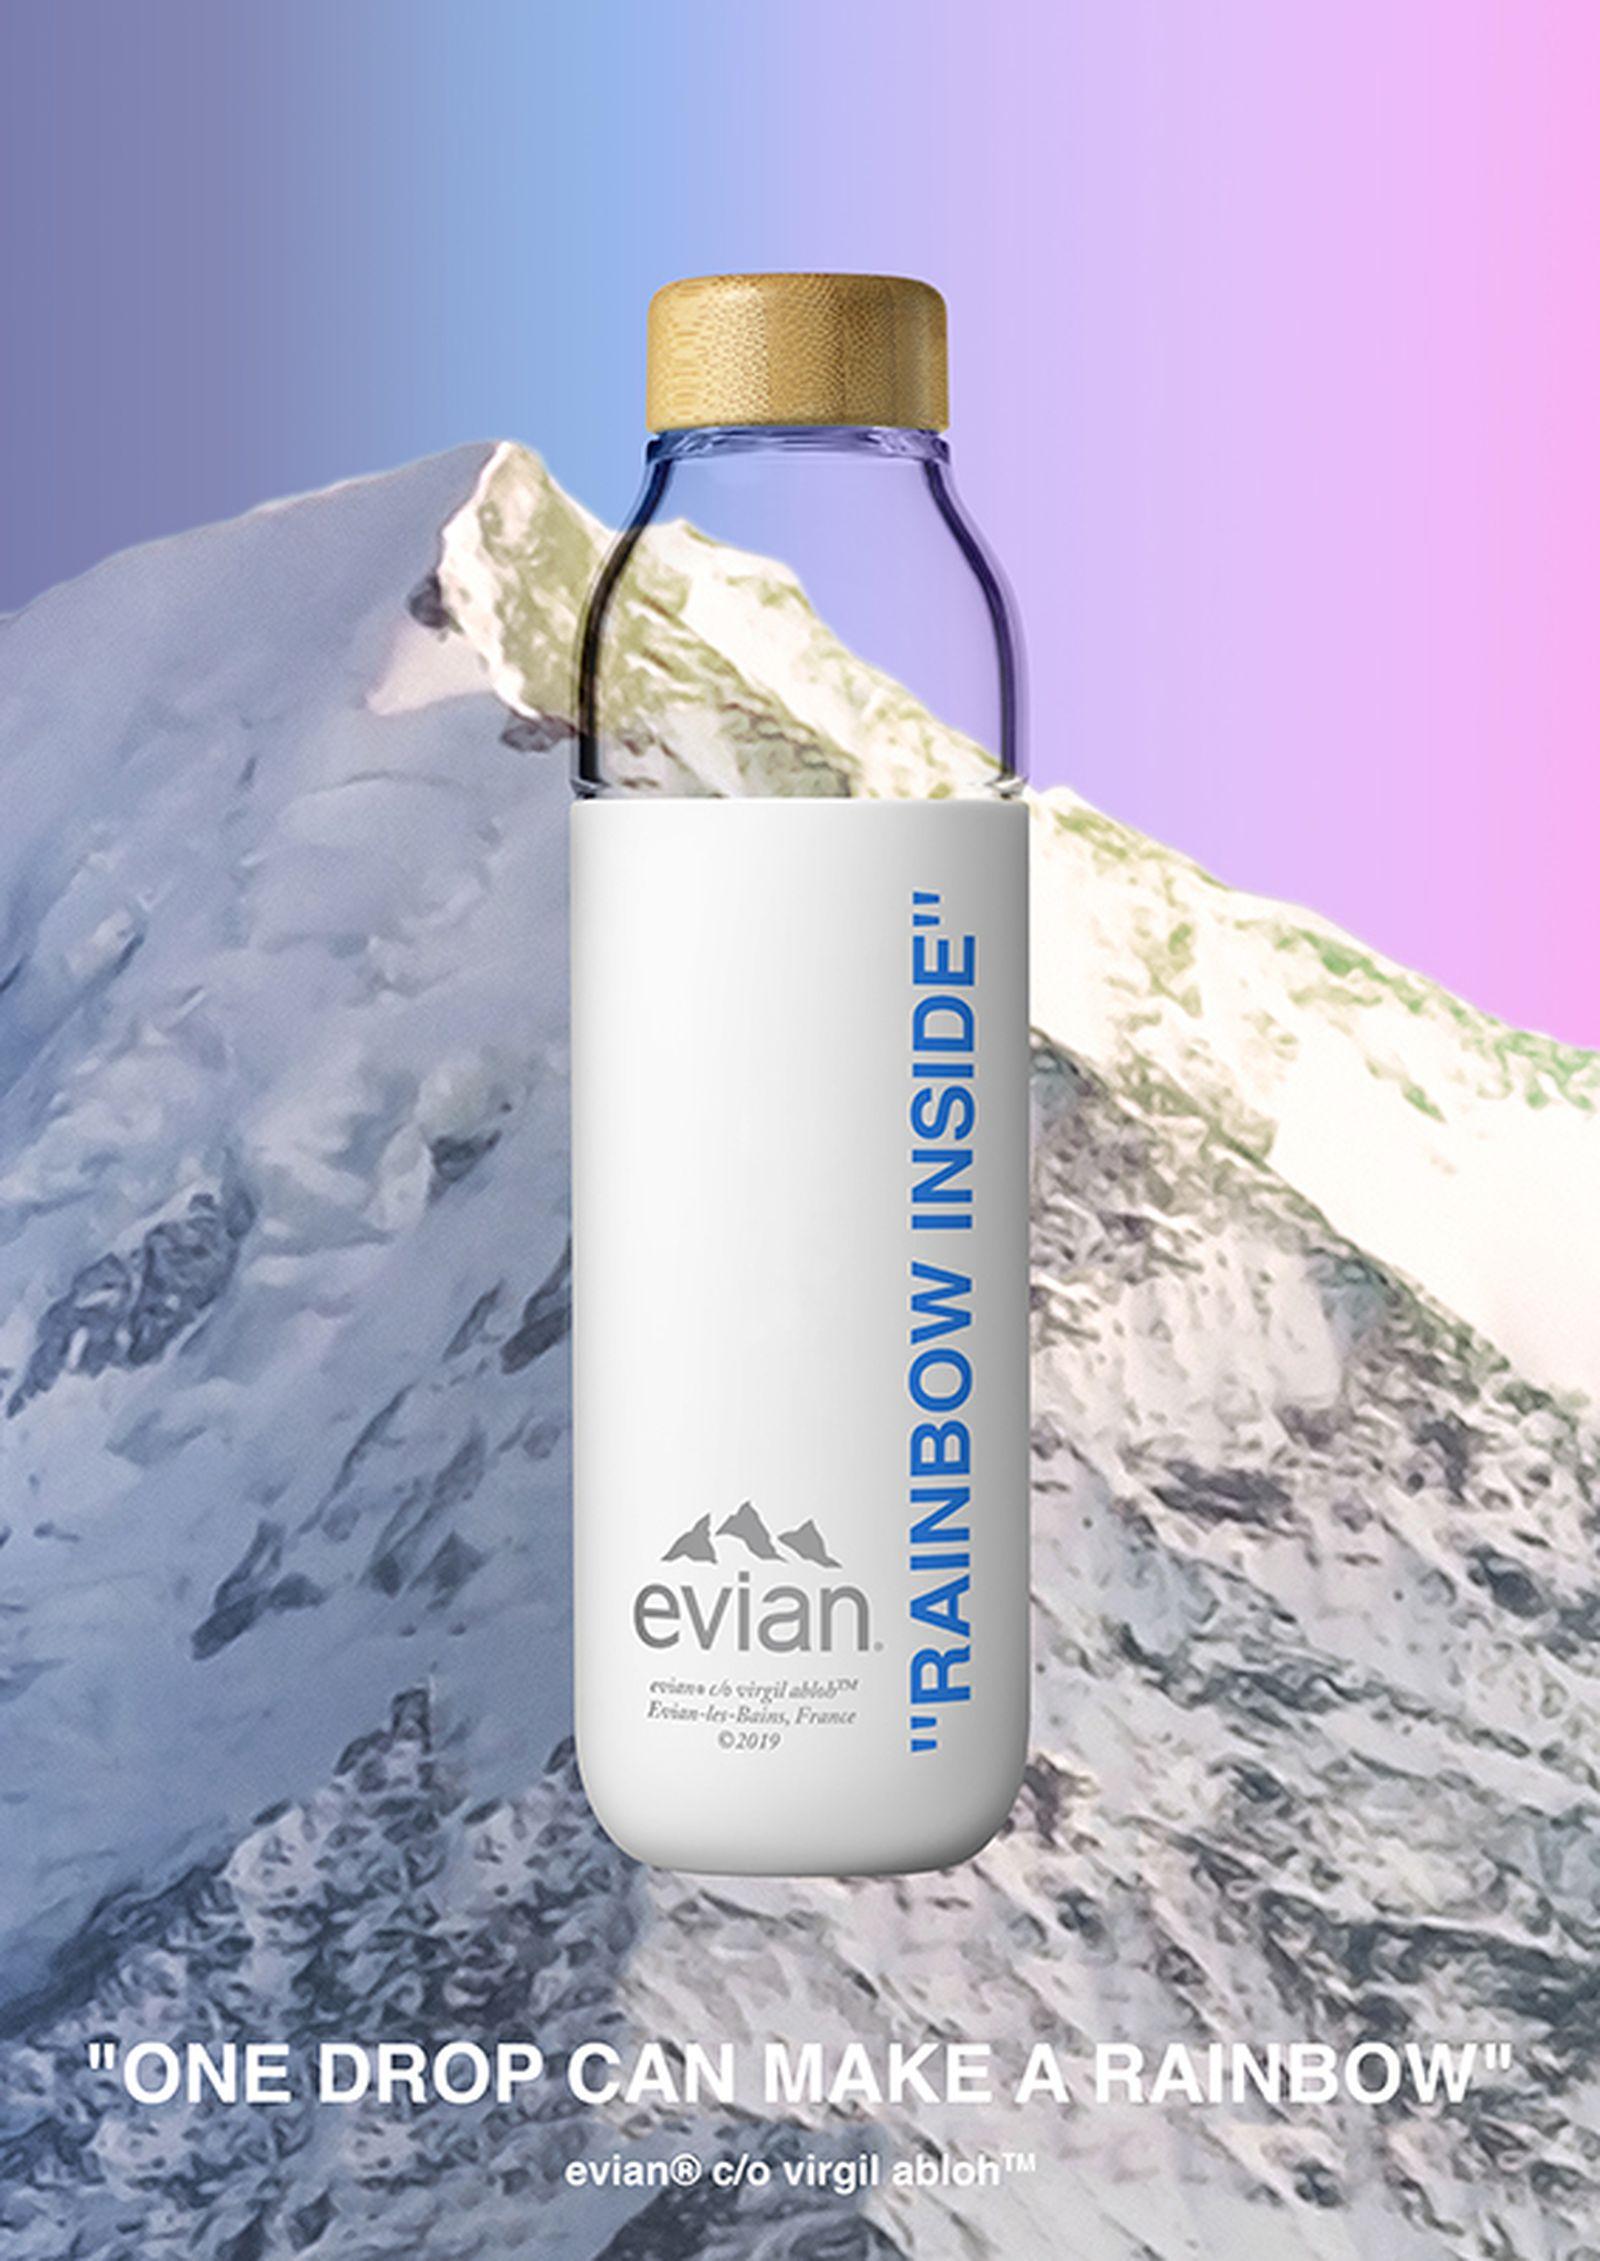 evian by virgil abloh water bottle soma